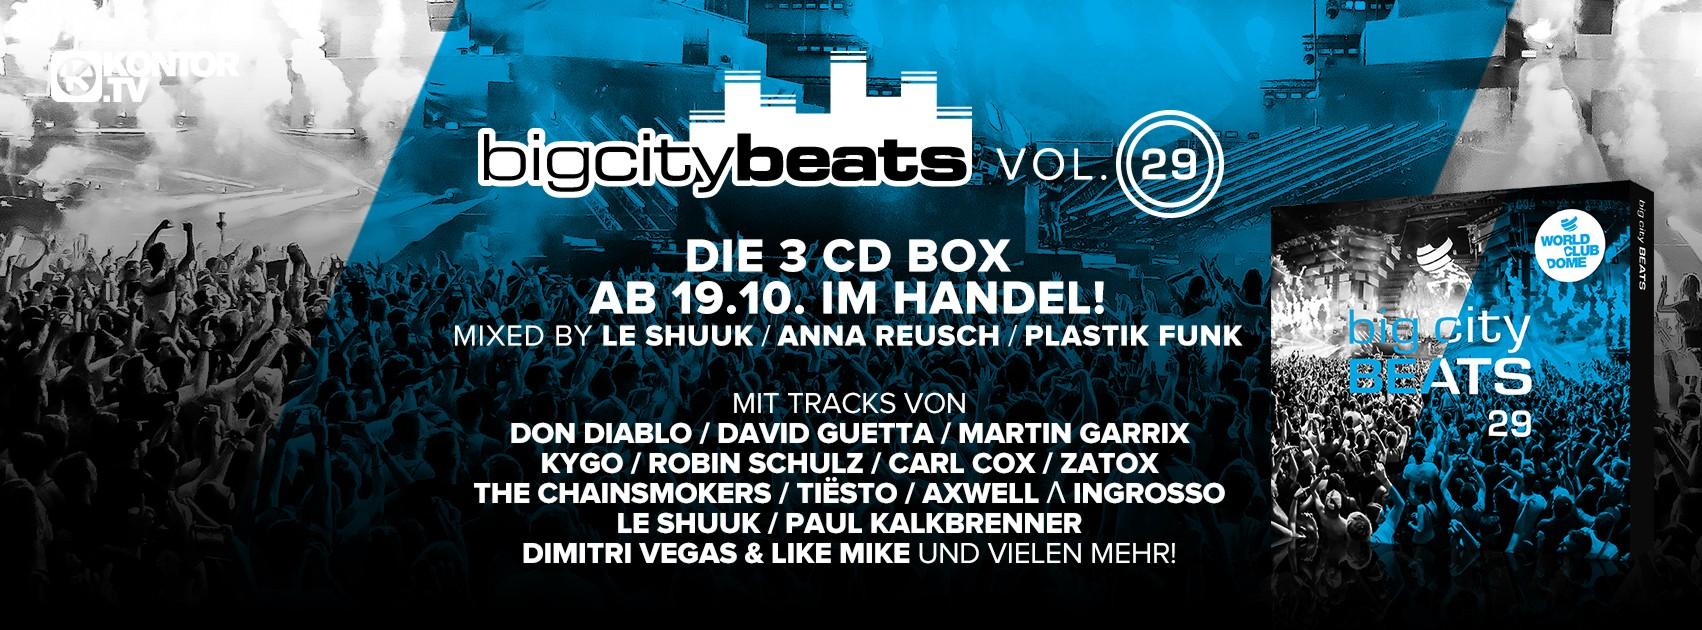 Bigcitybeats Vol 29 World Club Dome 2018 Winter Edition